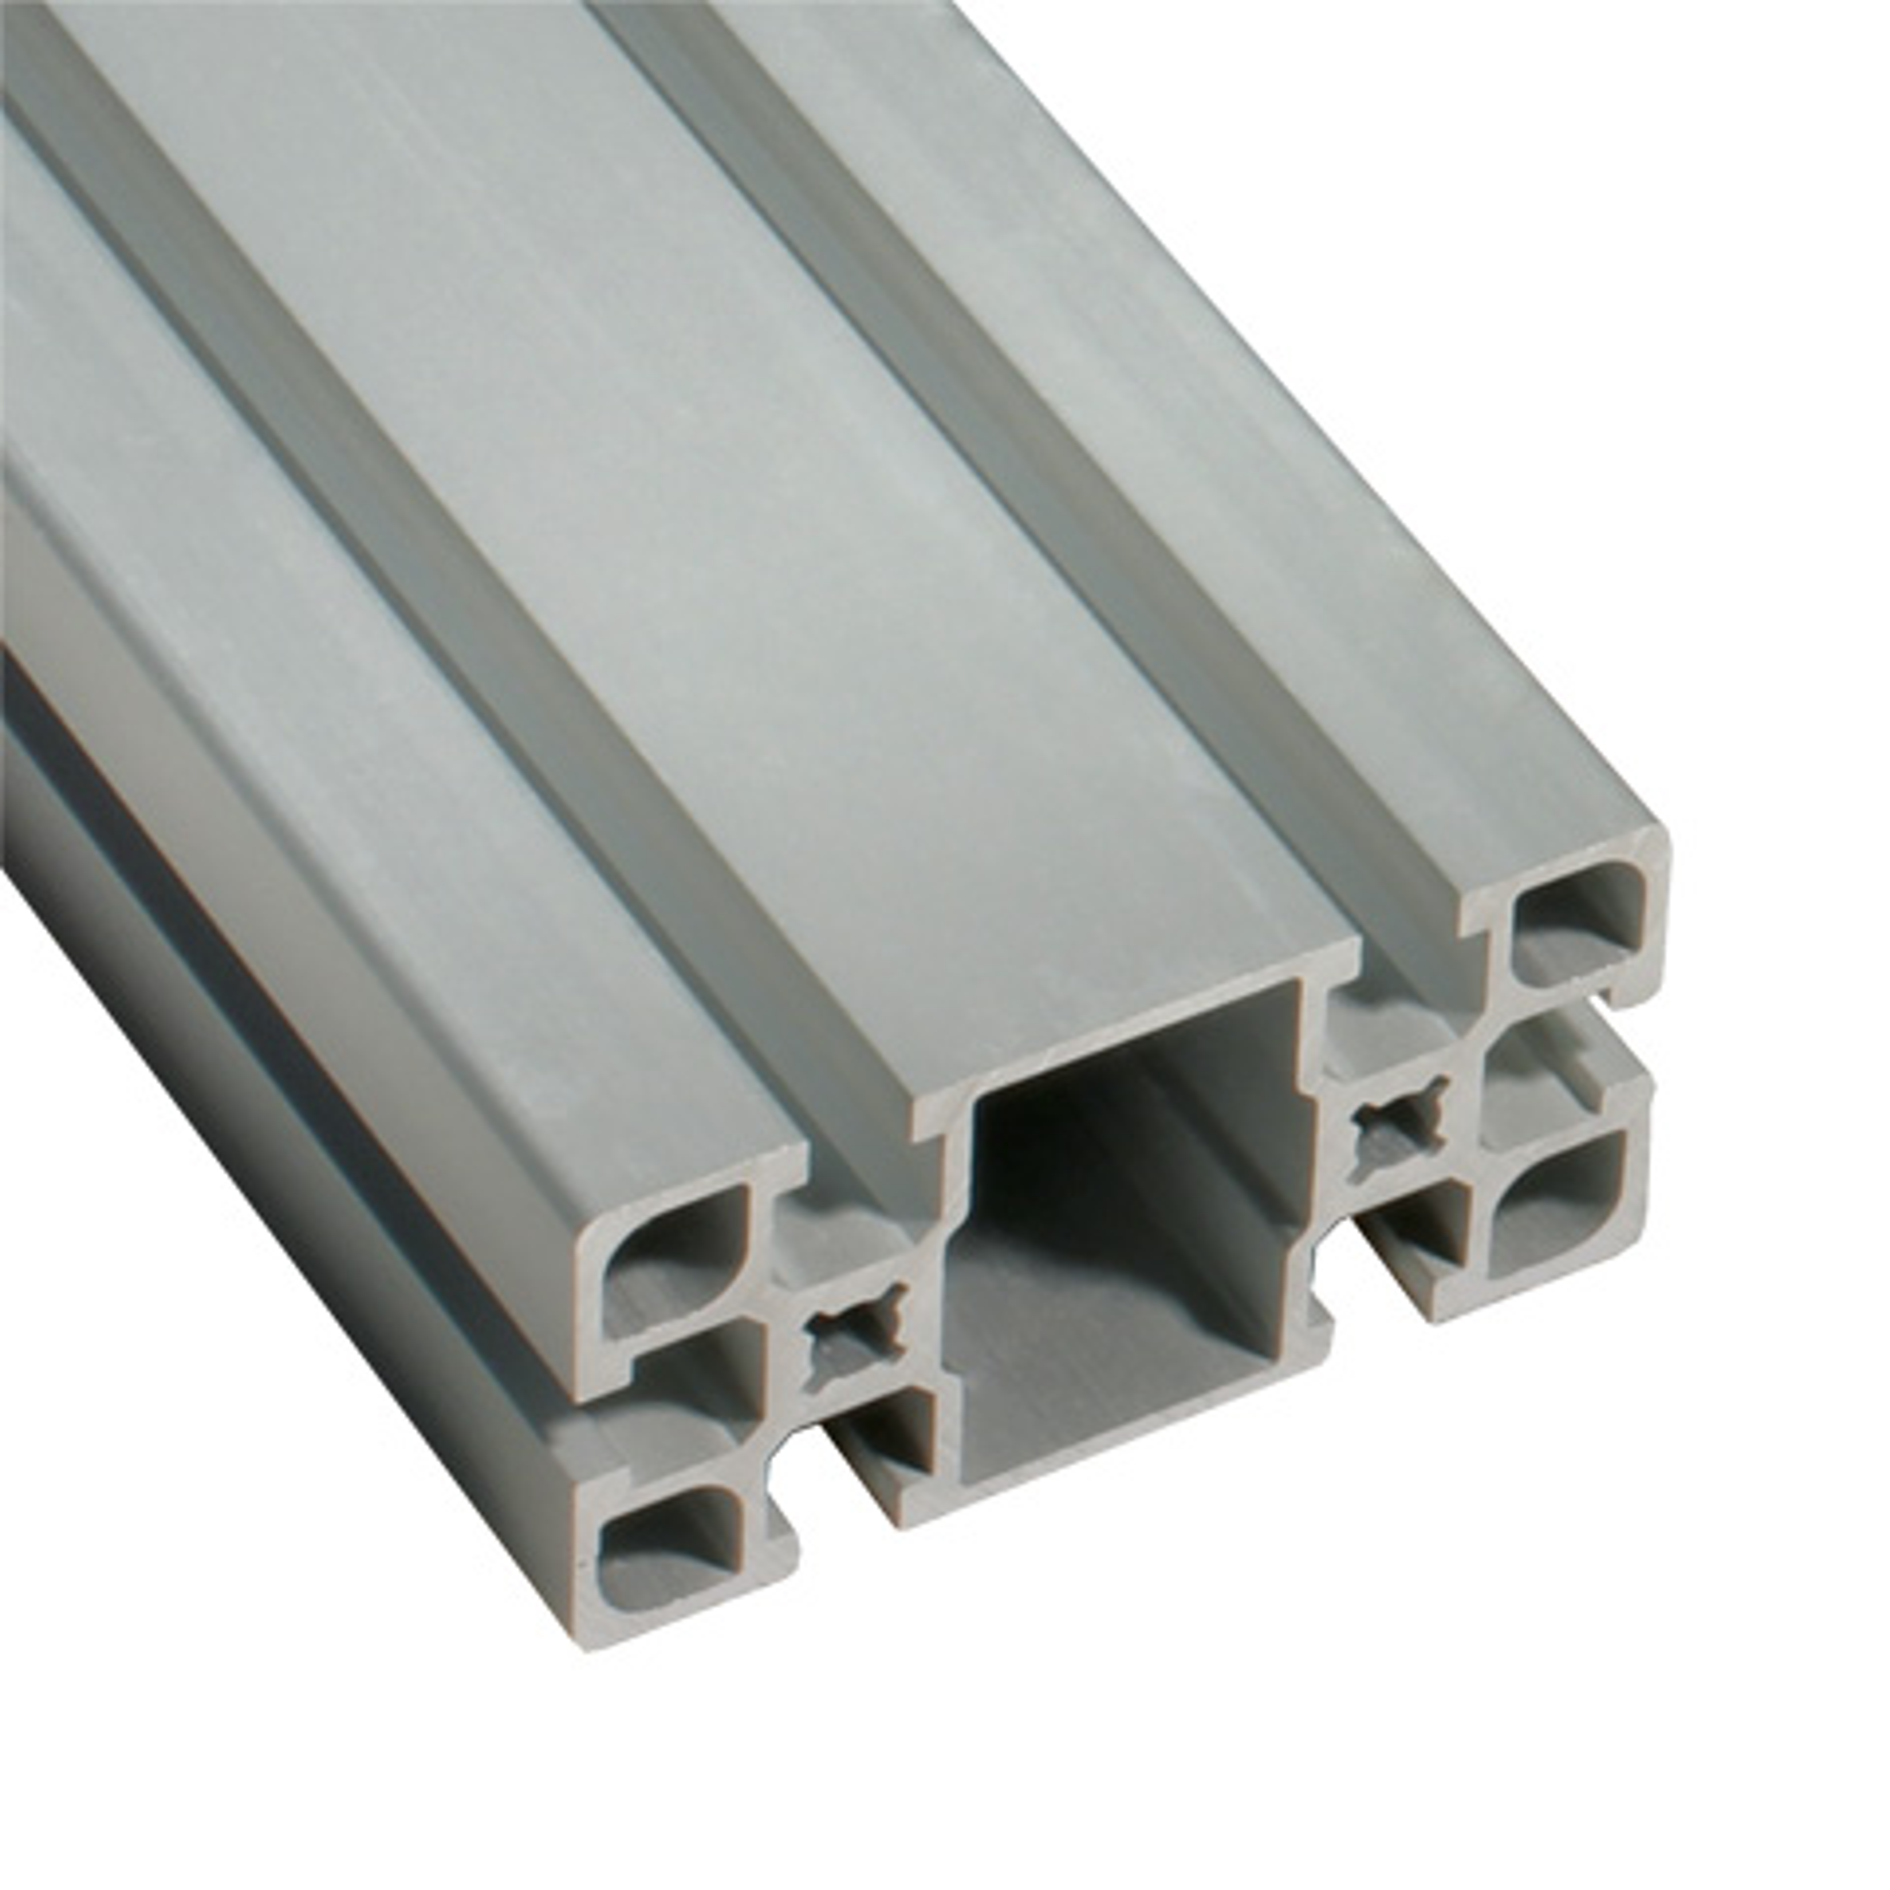 profil aluminium standard composants m caniques engrenages hpc. Black Bedroom Furniture Sets. Home Design Ideas